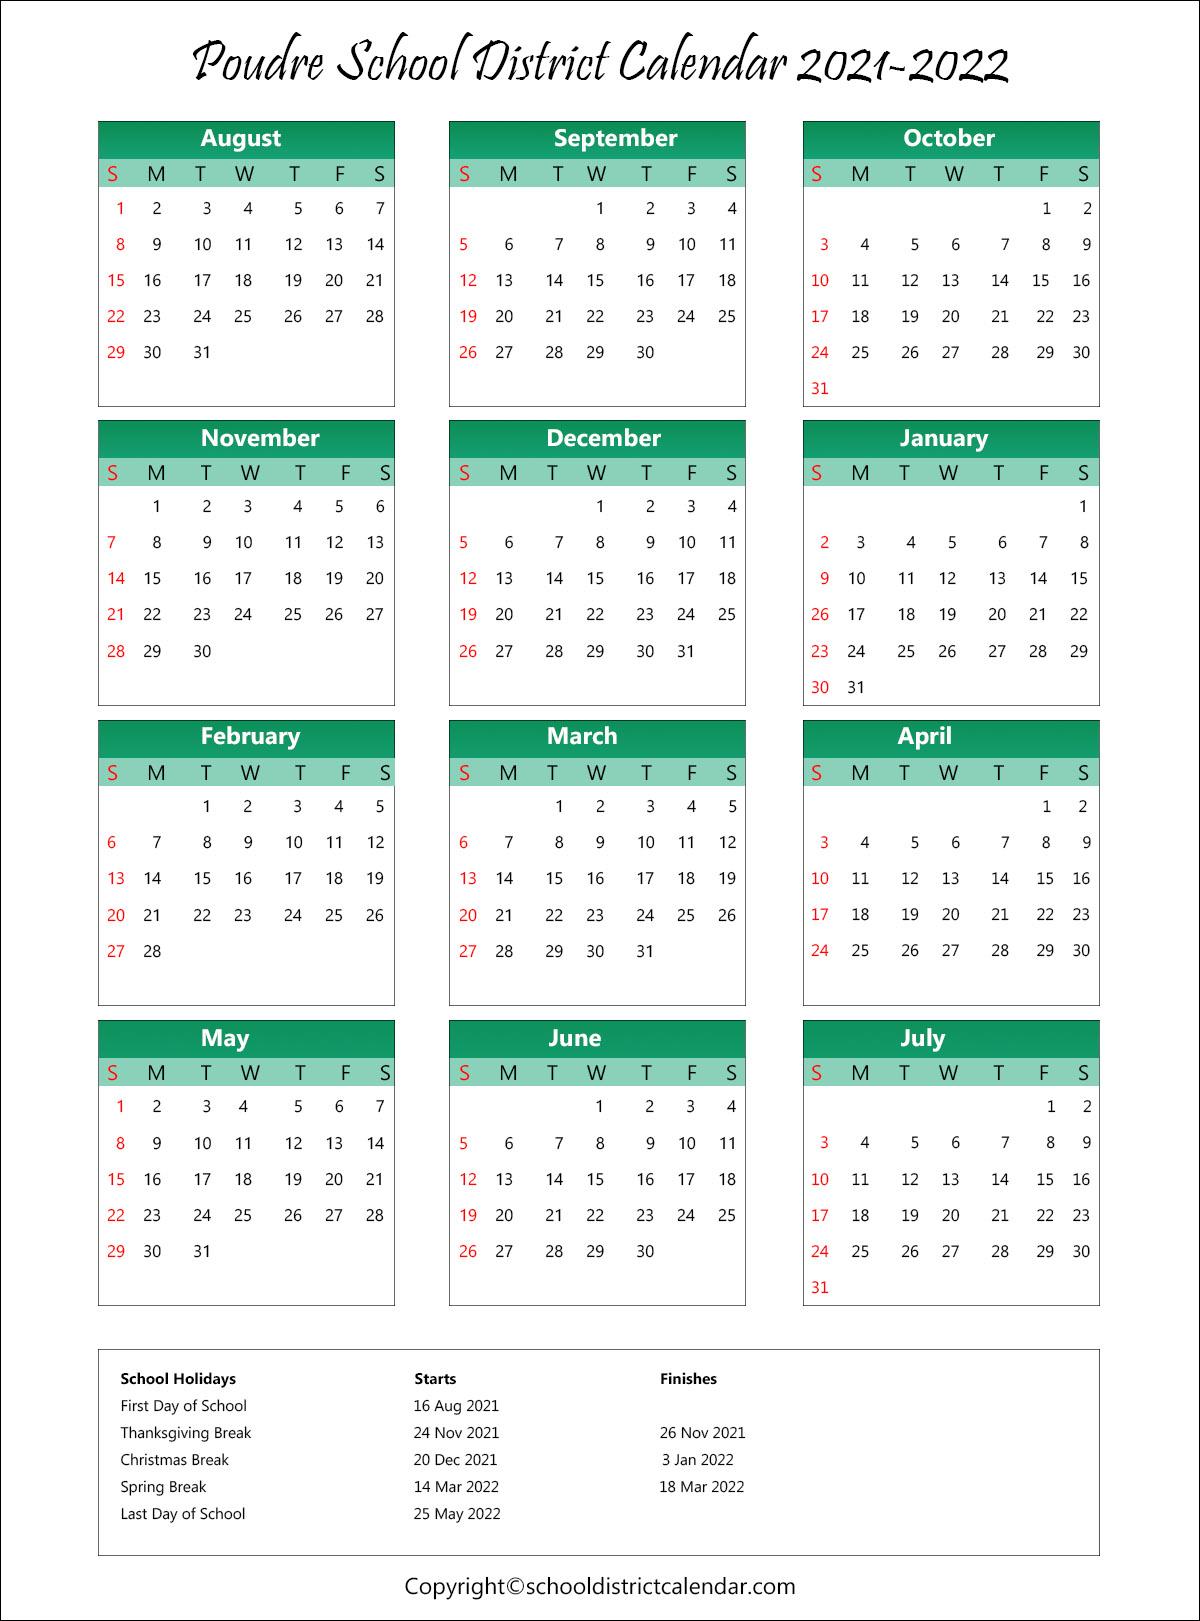 Poudre School District, Colorado Calendar Holidays 2021